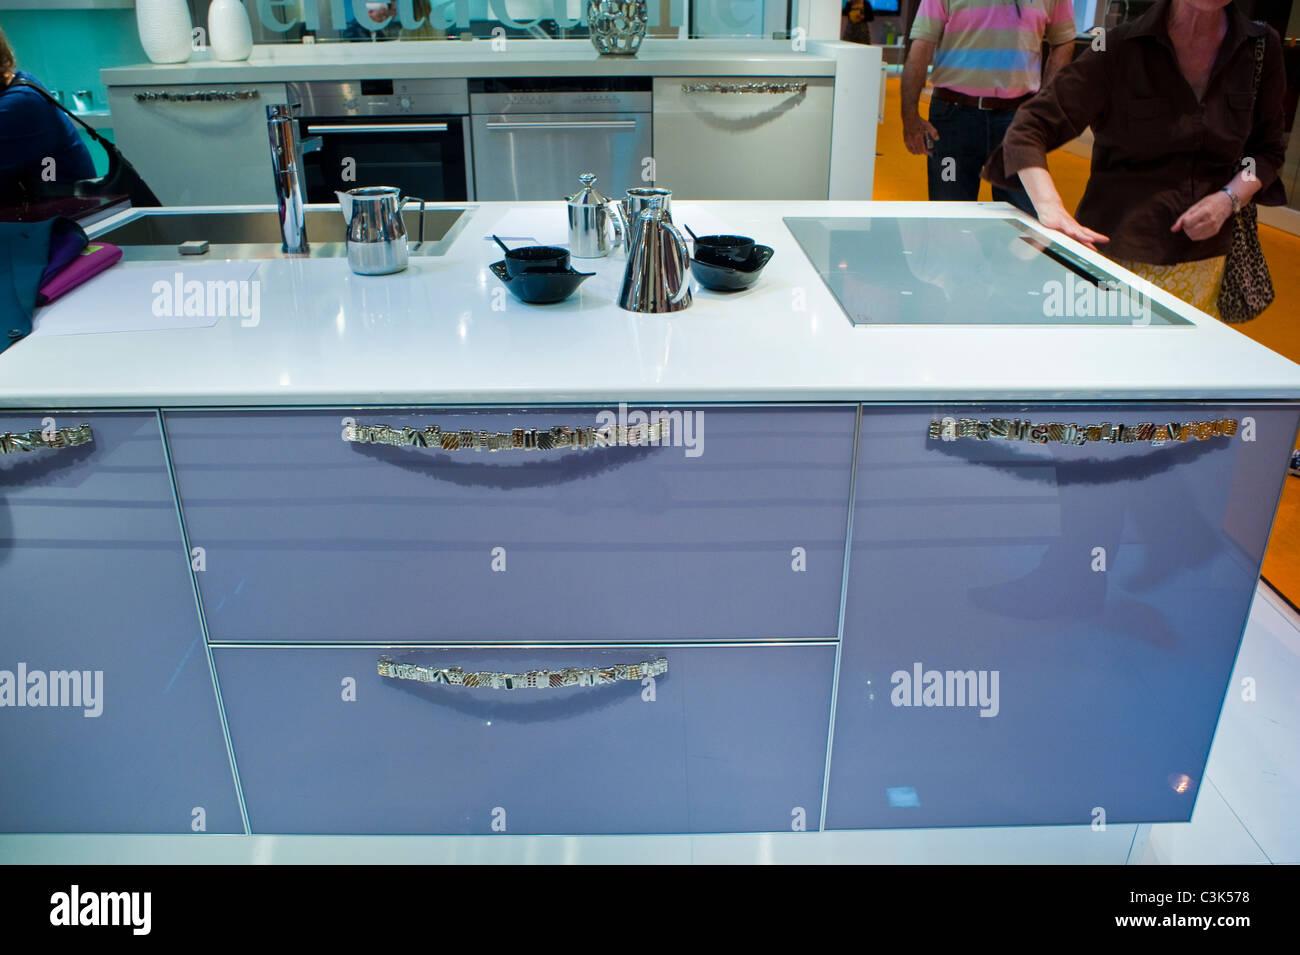 Paris France Kitchen Design Trade Stockfotos & Paris France Kitchen ...